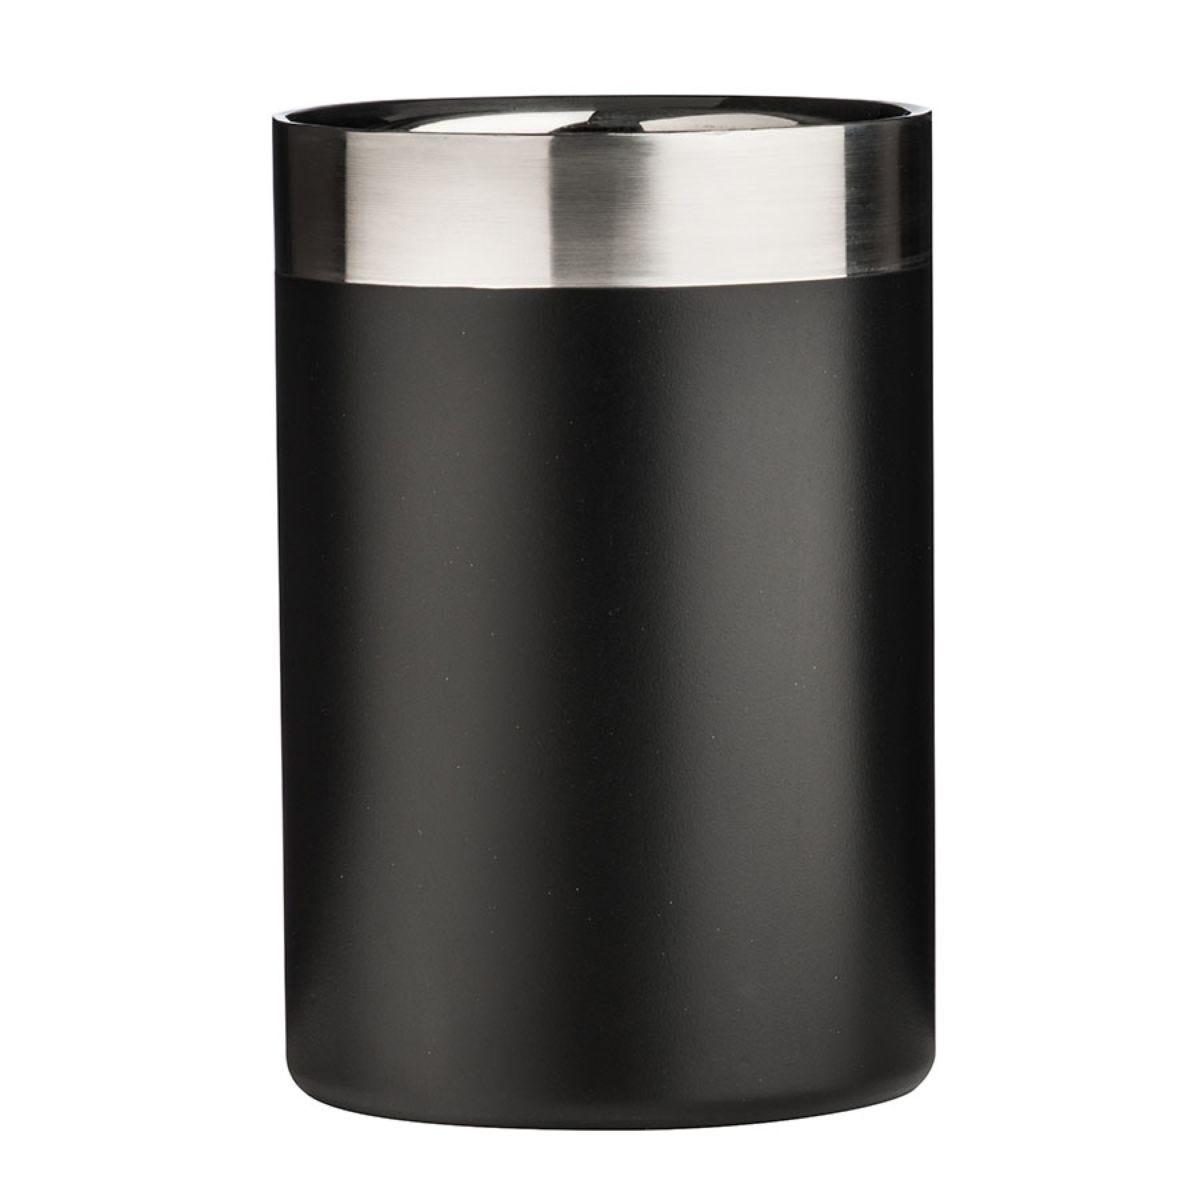 Premier Housewares Stainless Steel Bottle Cooler - Black